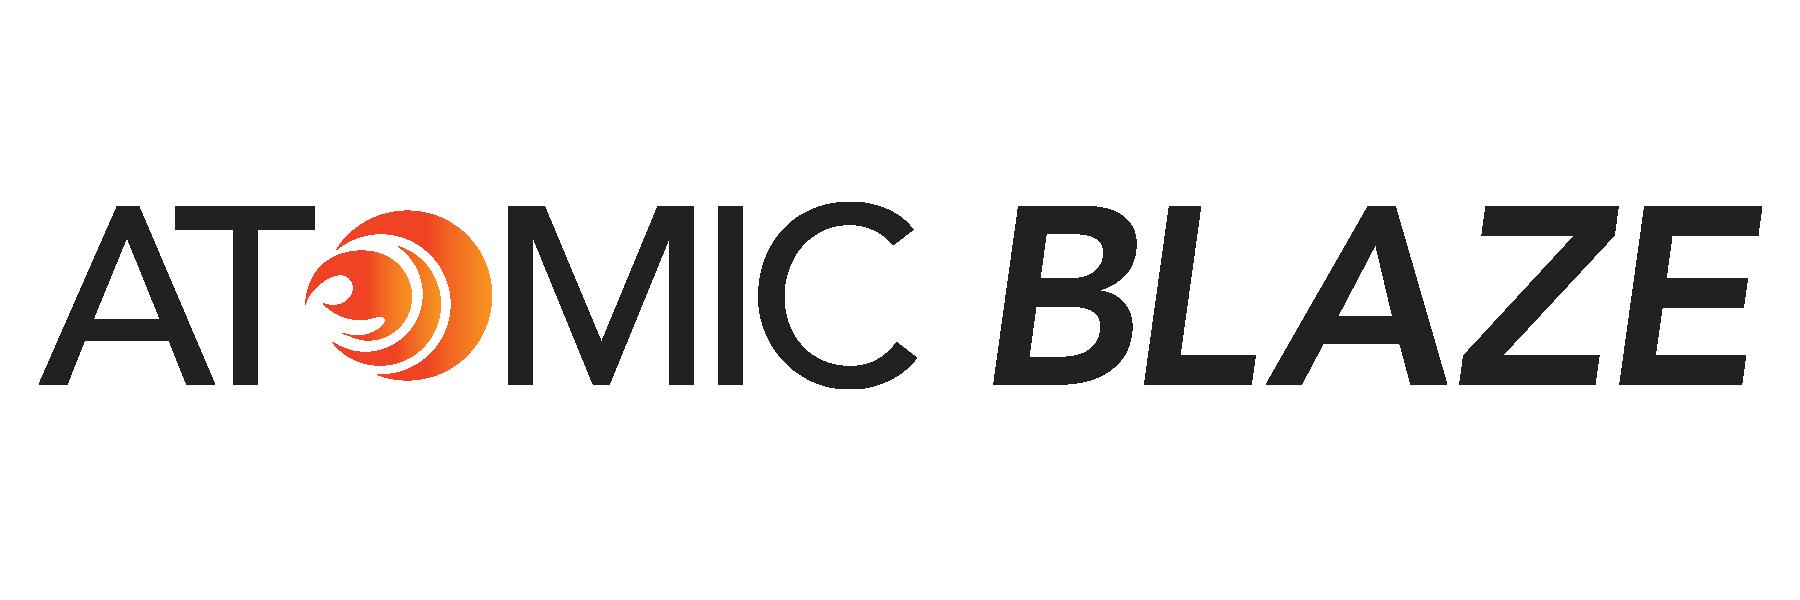 AtomicBlaze.com